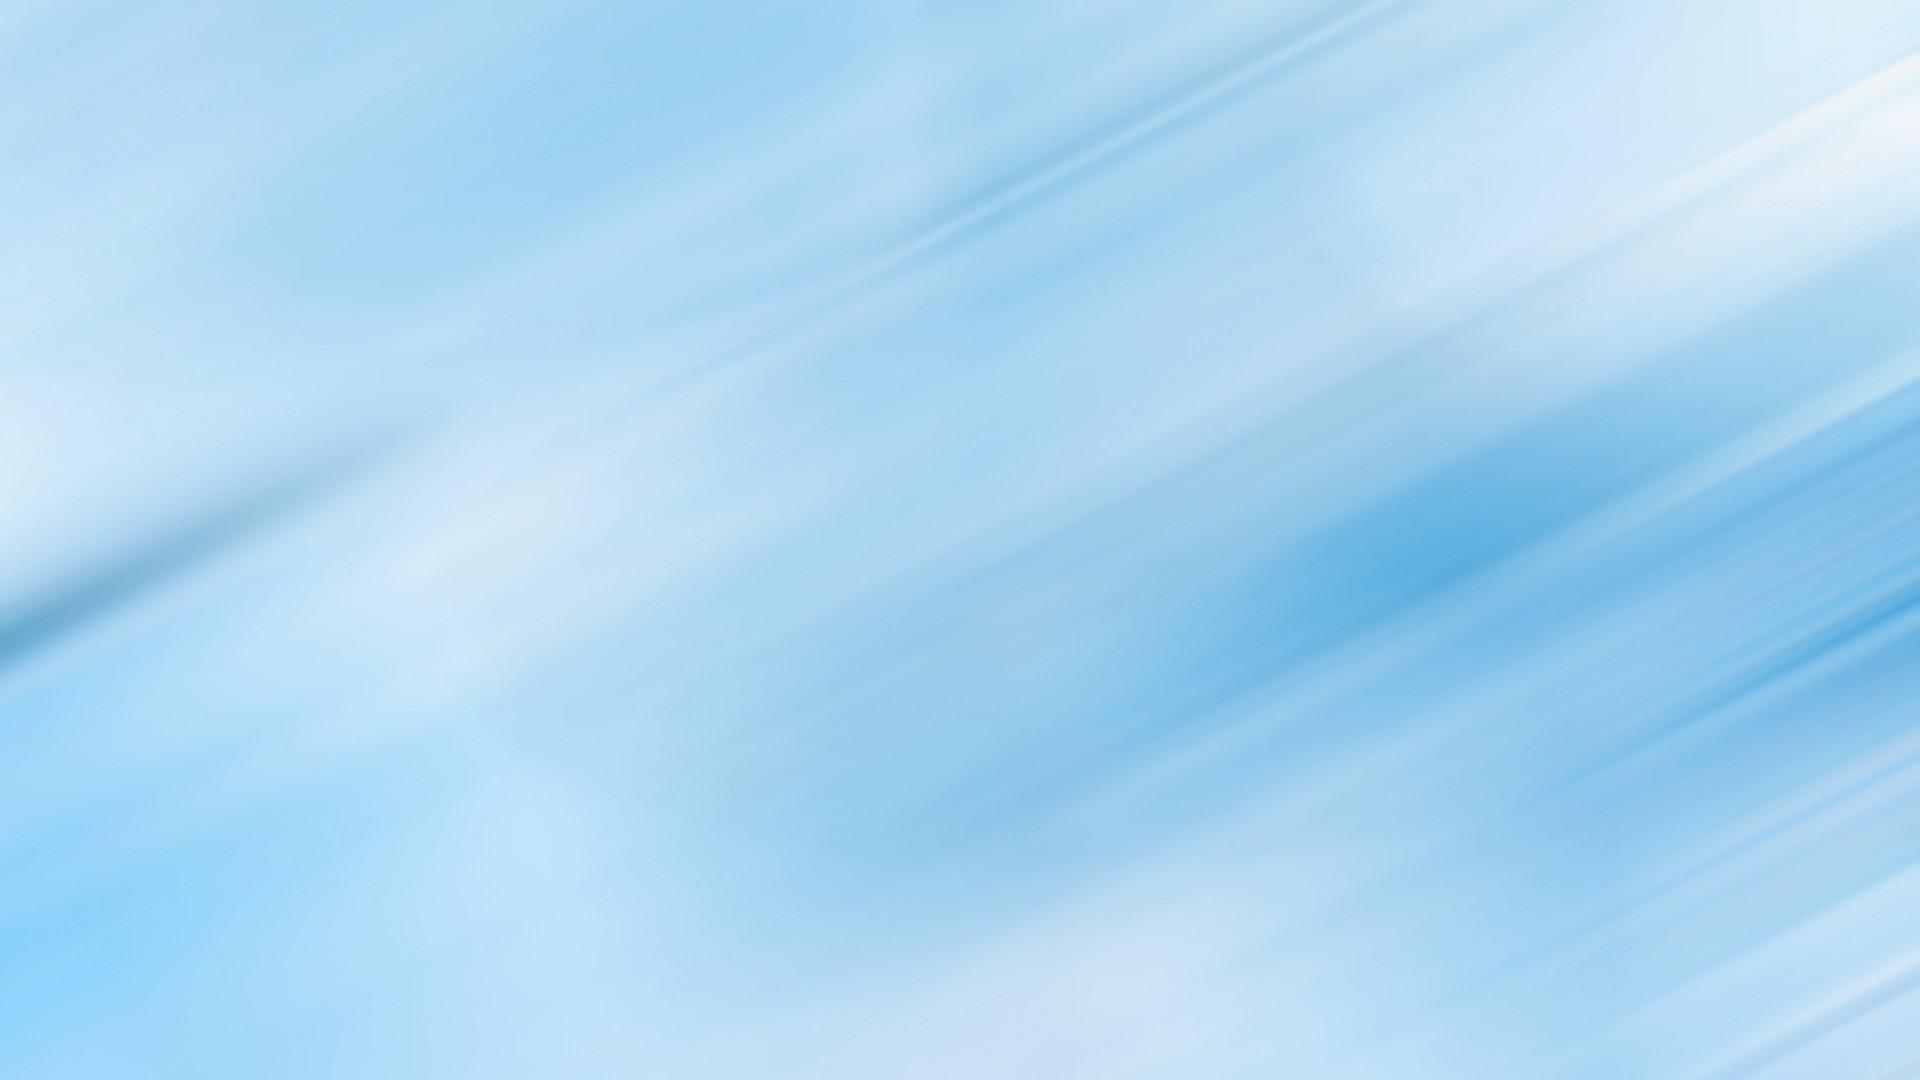 images for background wallpaper   Sky Blue Background wallpaper – 669946